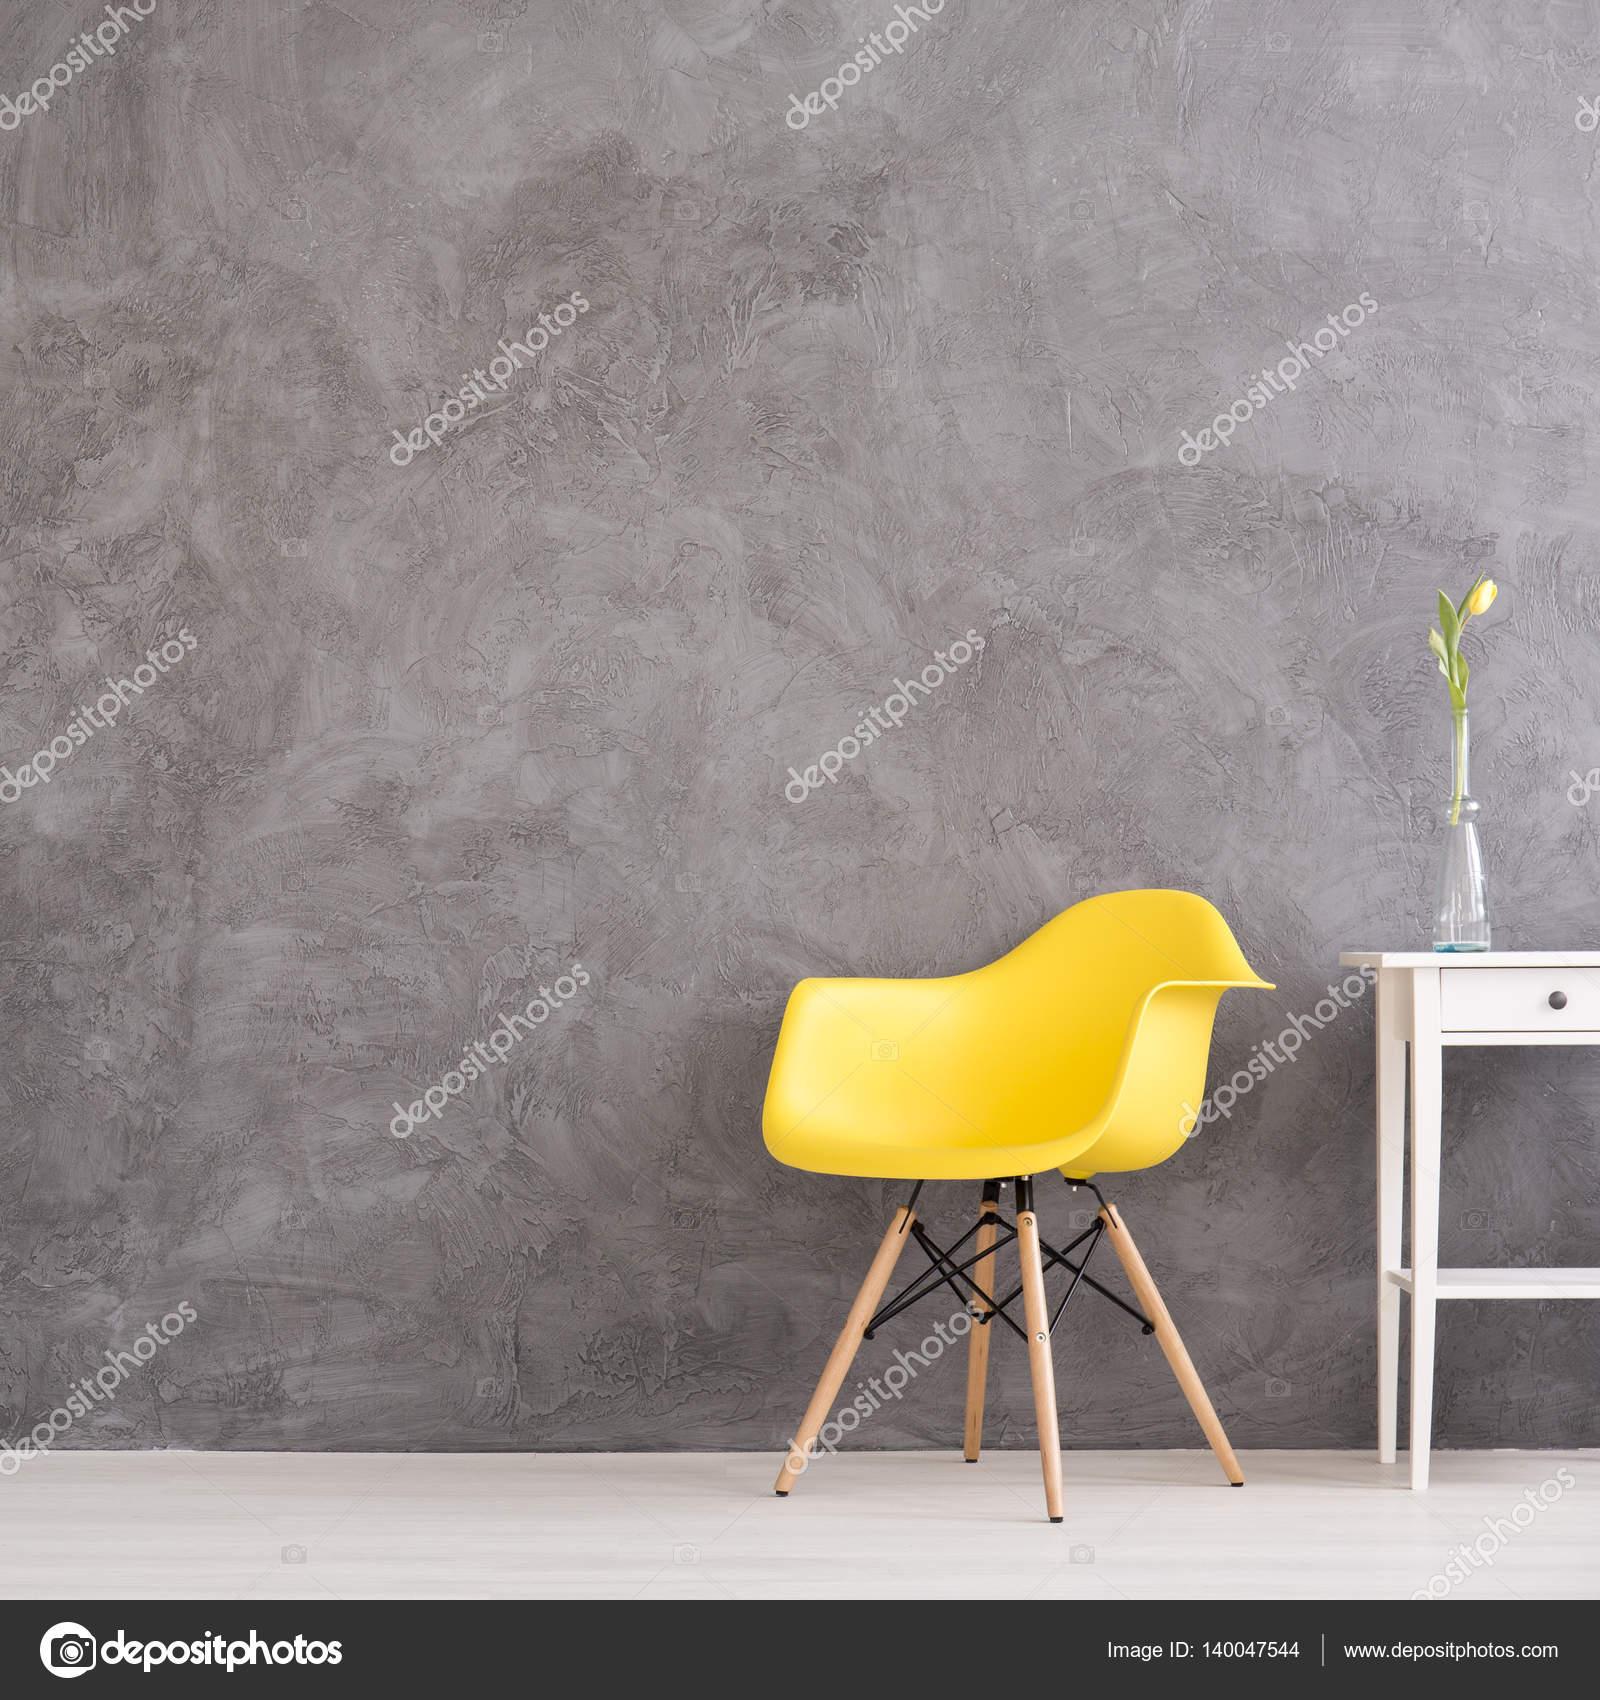 Gelber Stuhl In Grau Wandinnenseite Stockfoto Photographeeeu